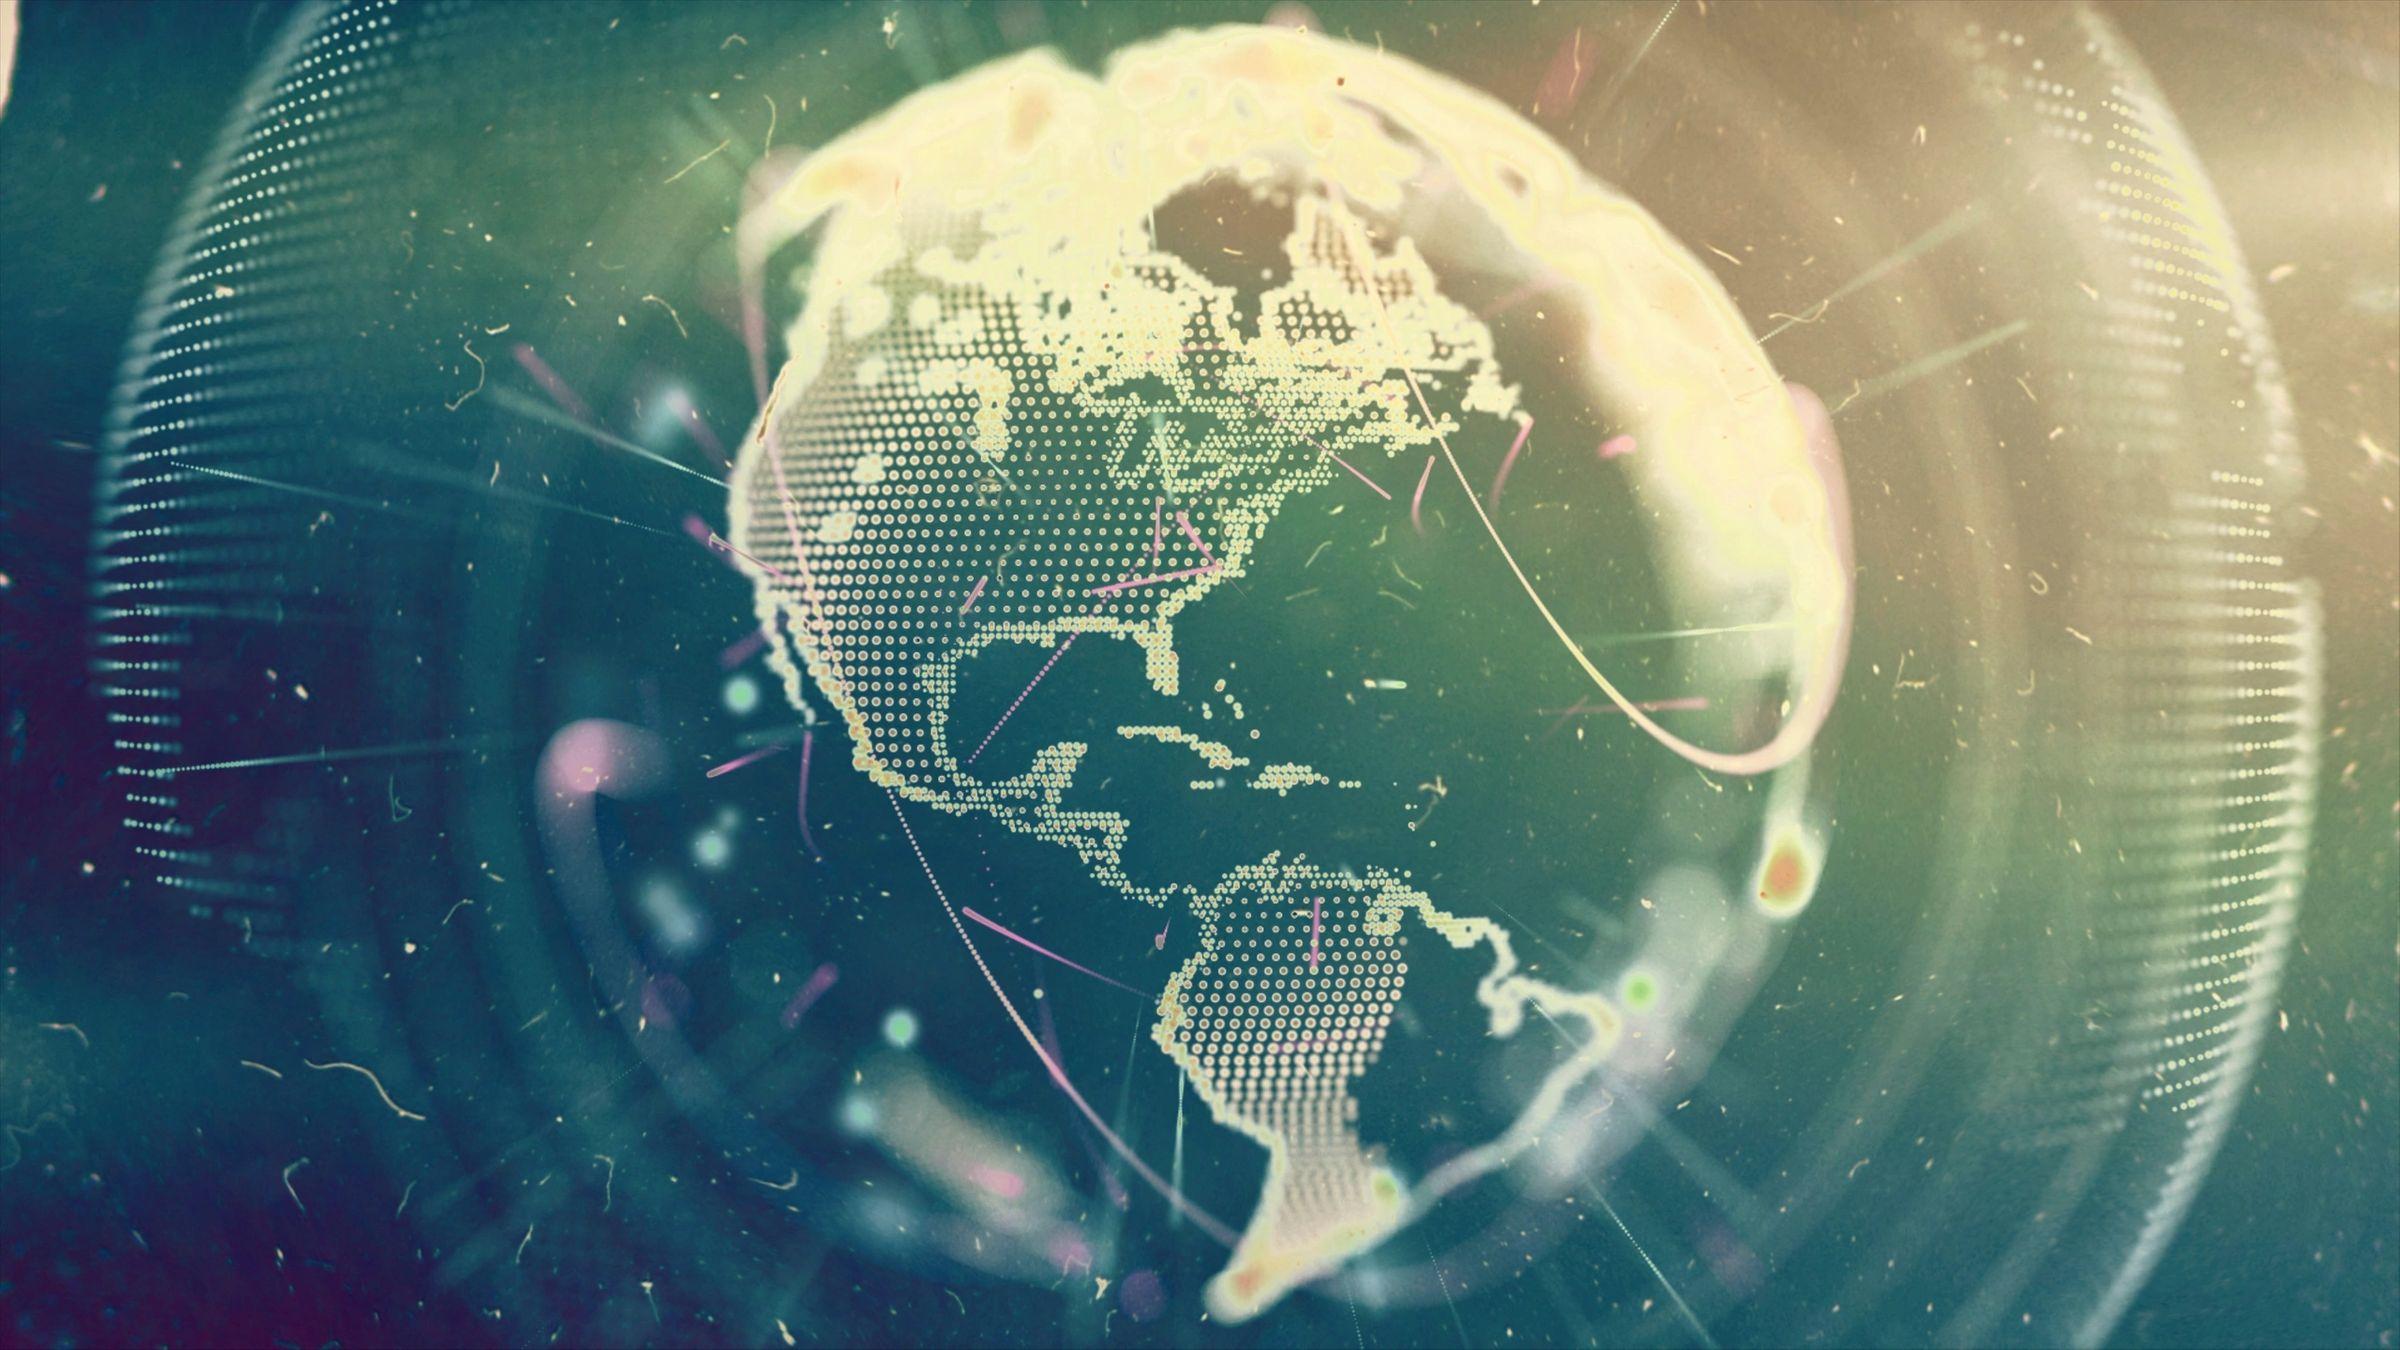 Springer International Conference on Trends in Modern Physics